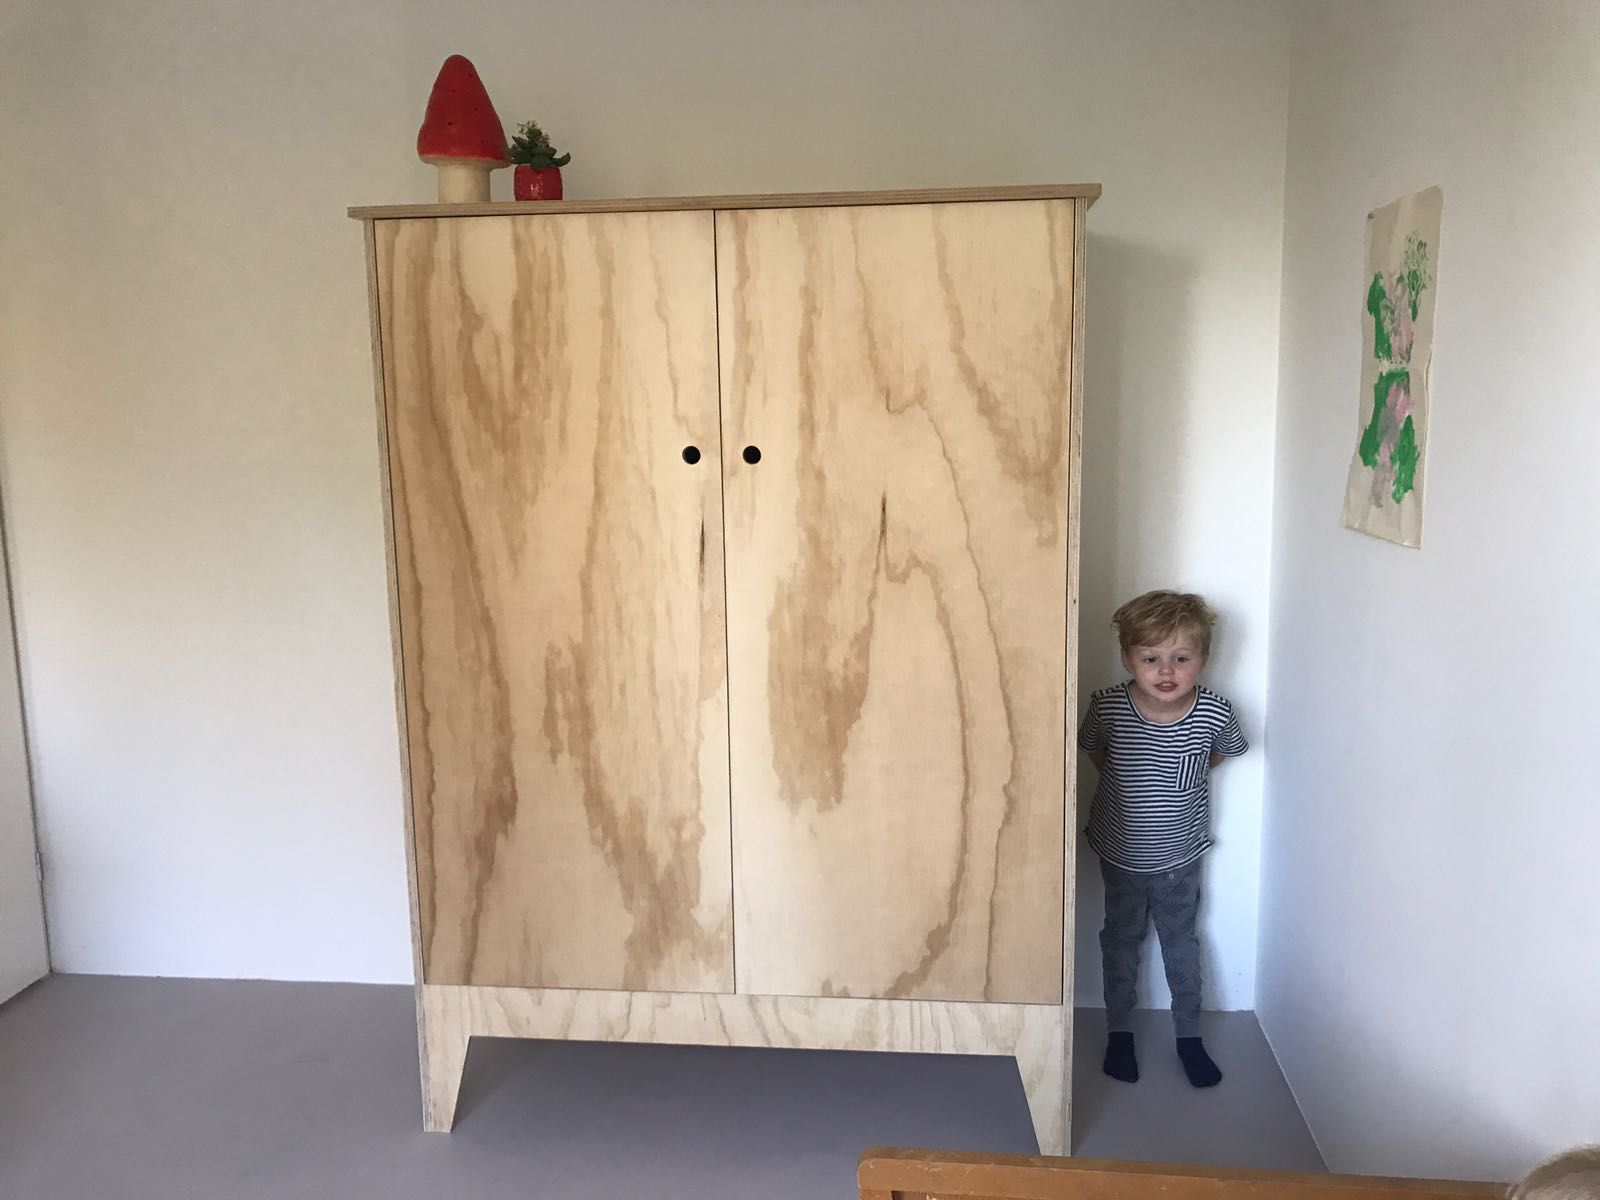 8x Minimalistische Kinderkamers : Kinderkledingkast van multiplex kledingkast kinderkamer inspiratie